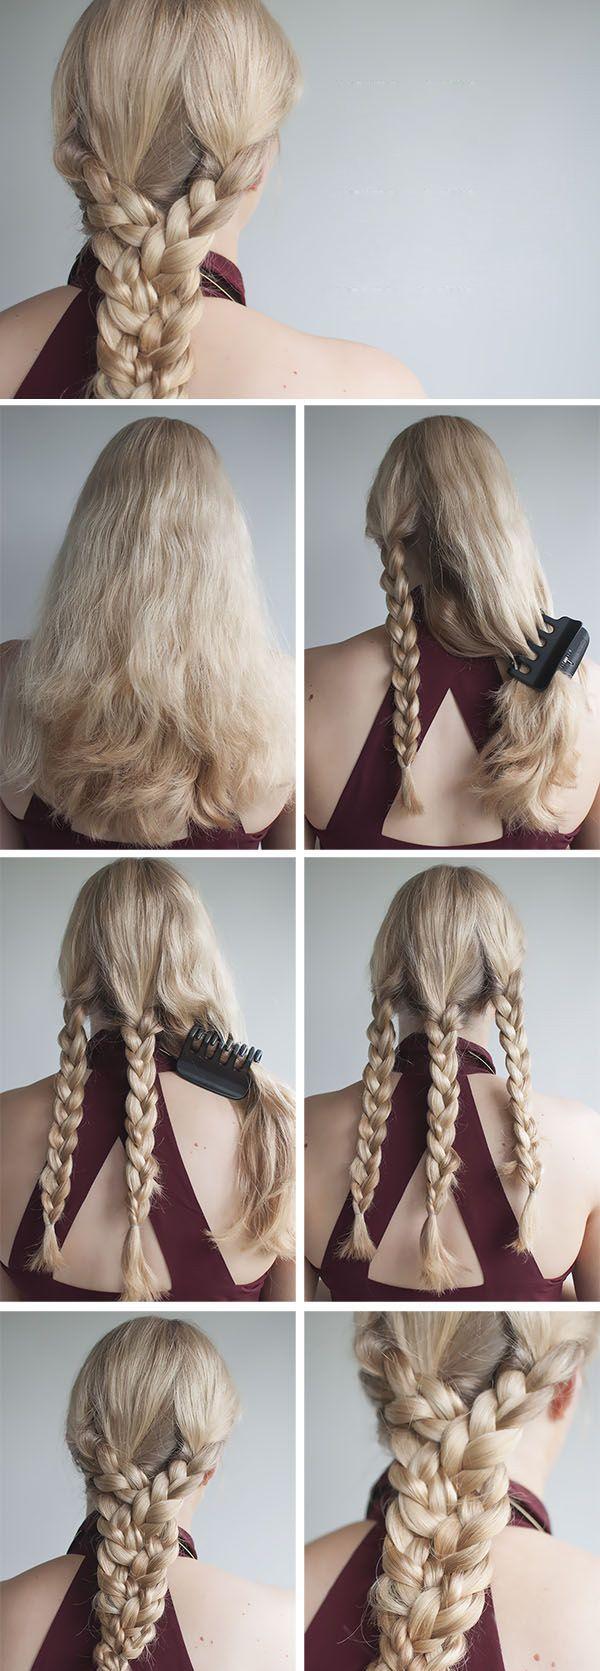 scandinavian hairstyle